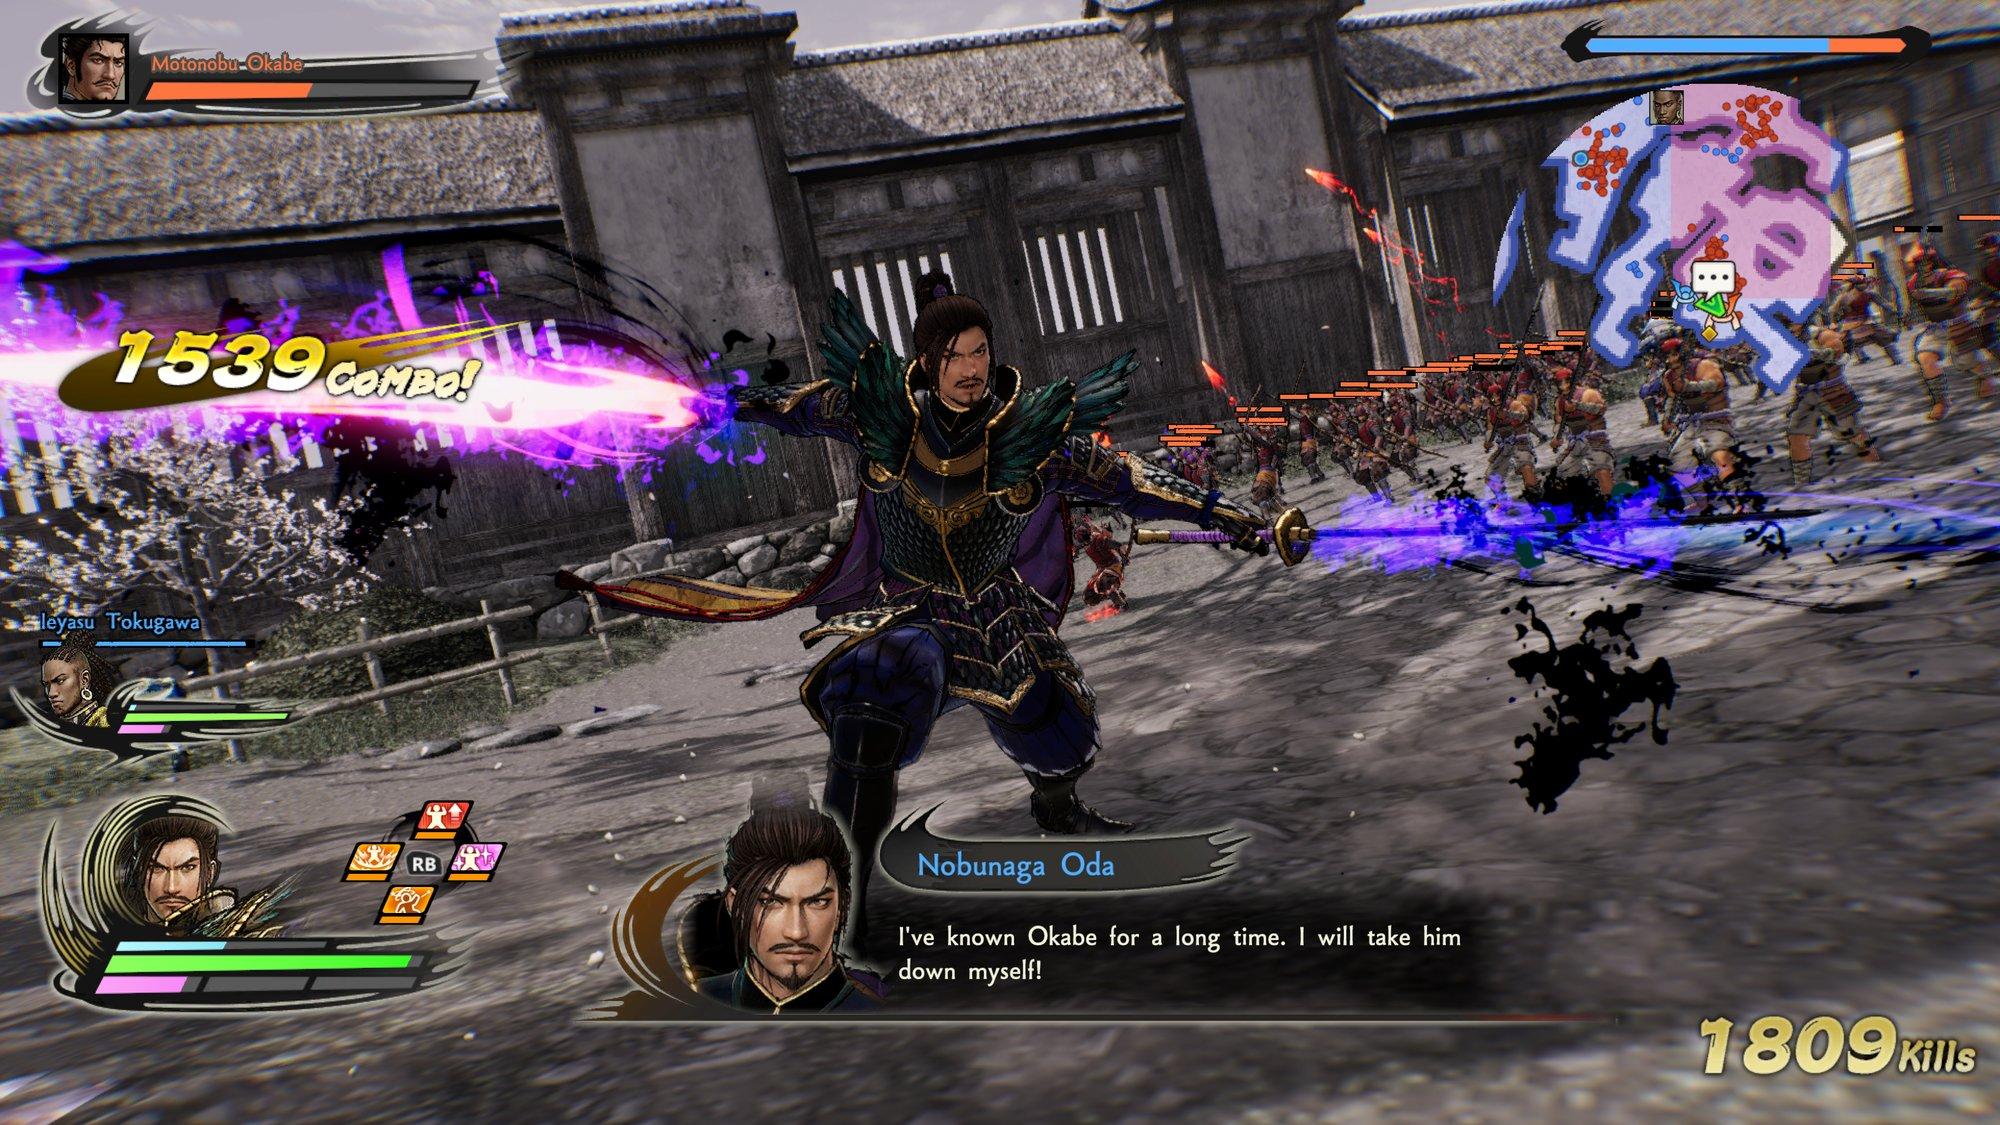 Oda Nobunaga, versione matura